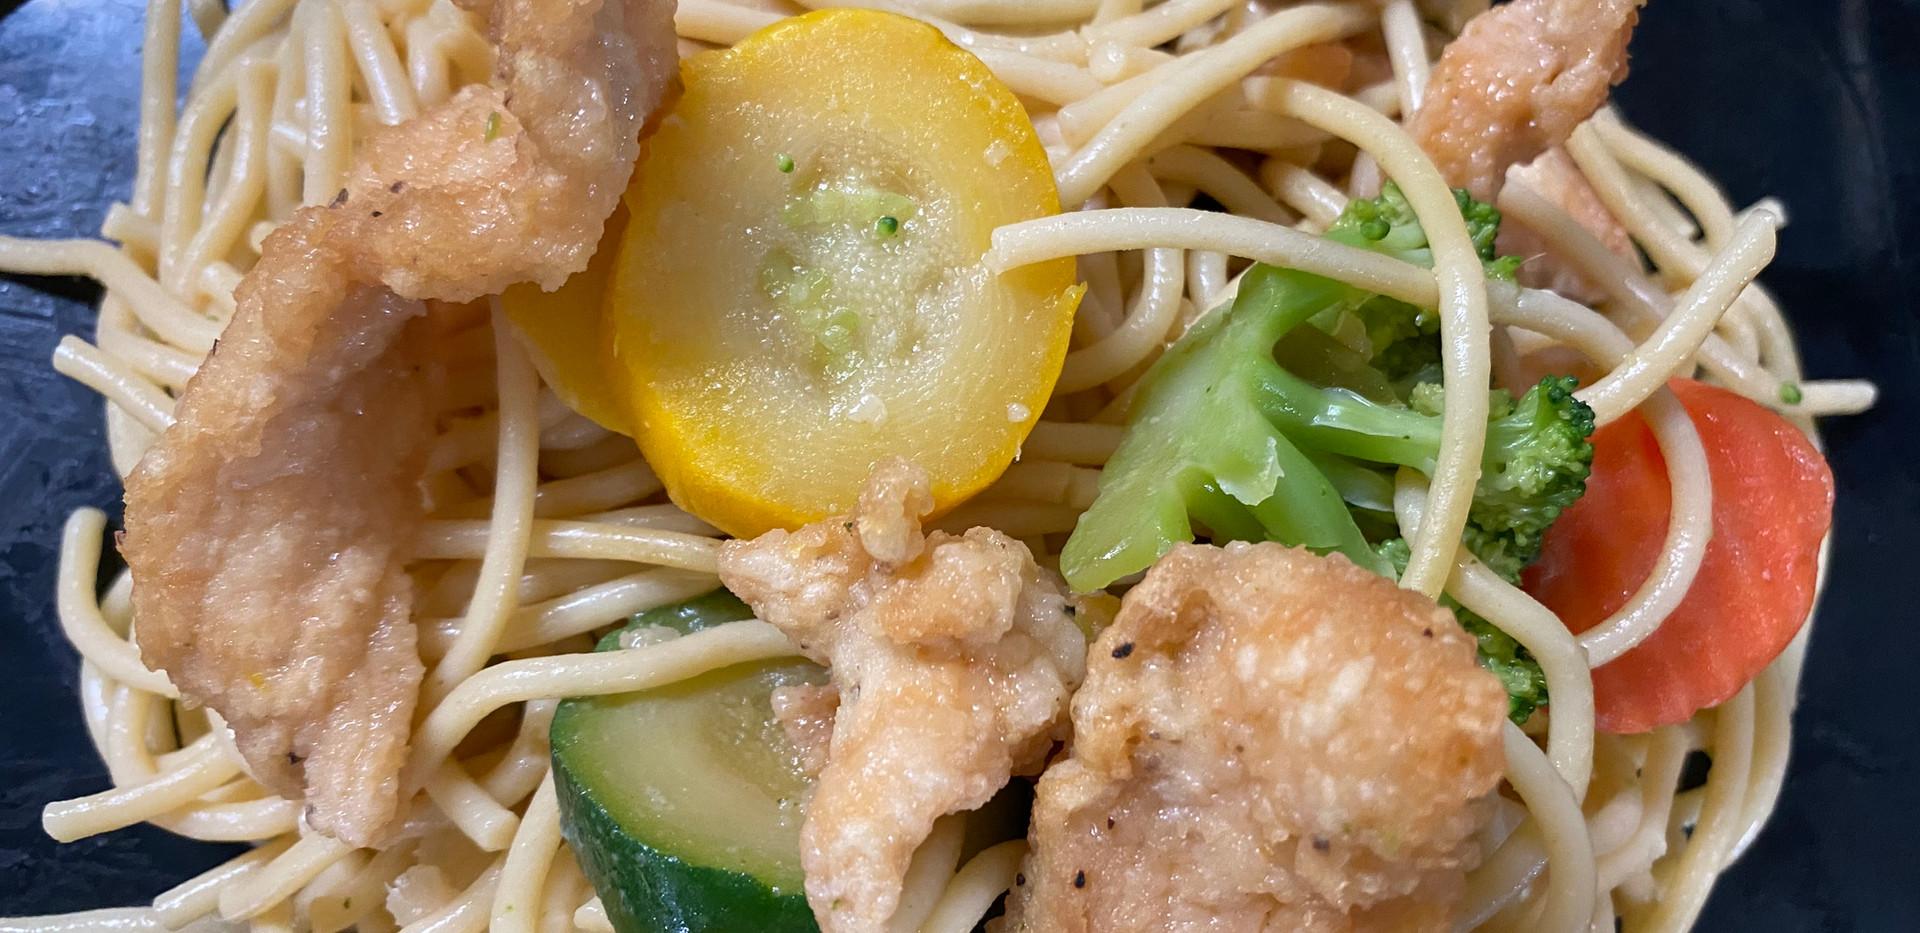 Chicken and Pasta Primavera